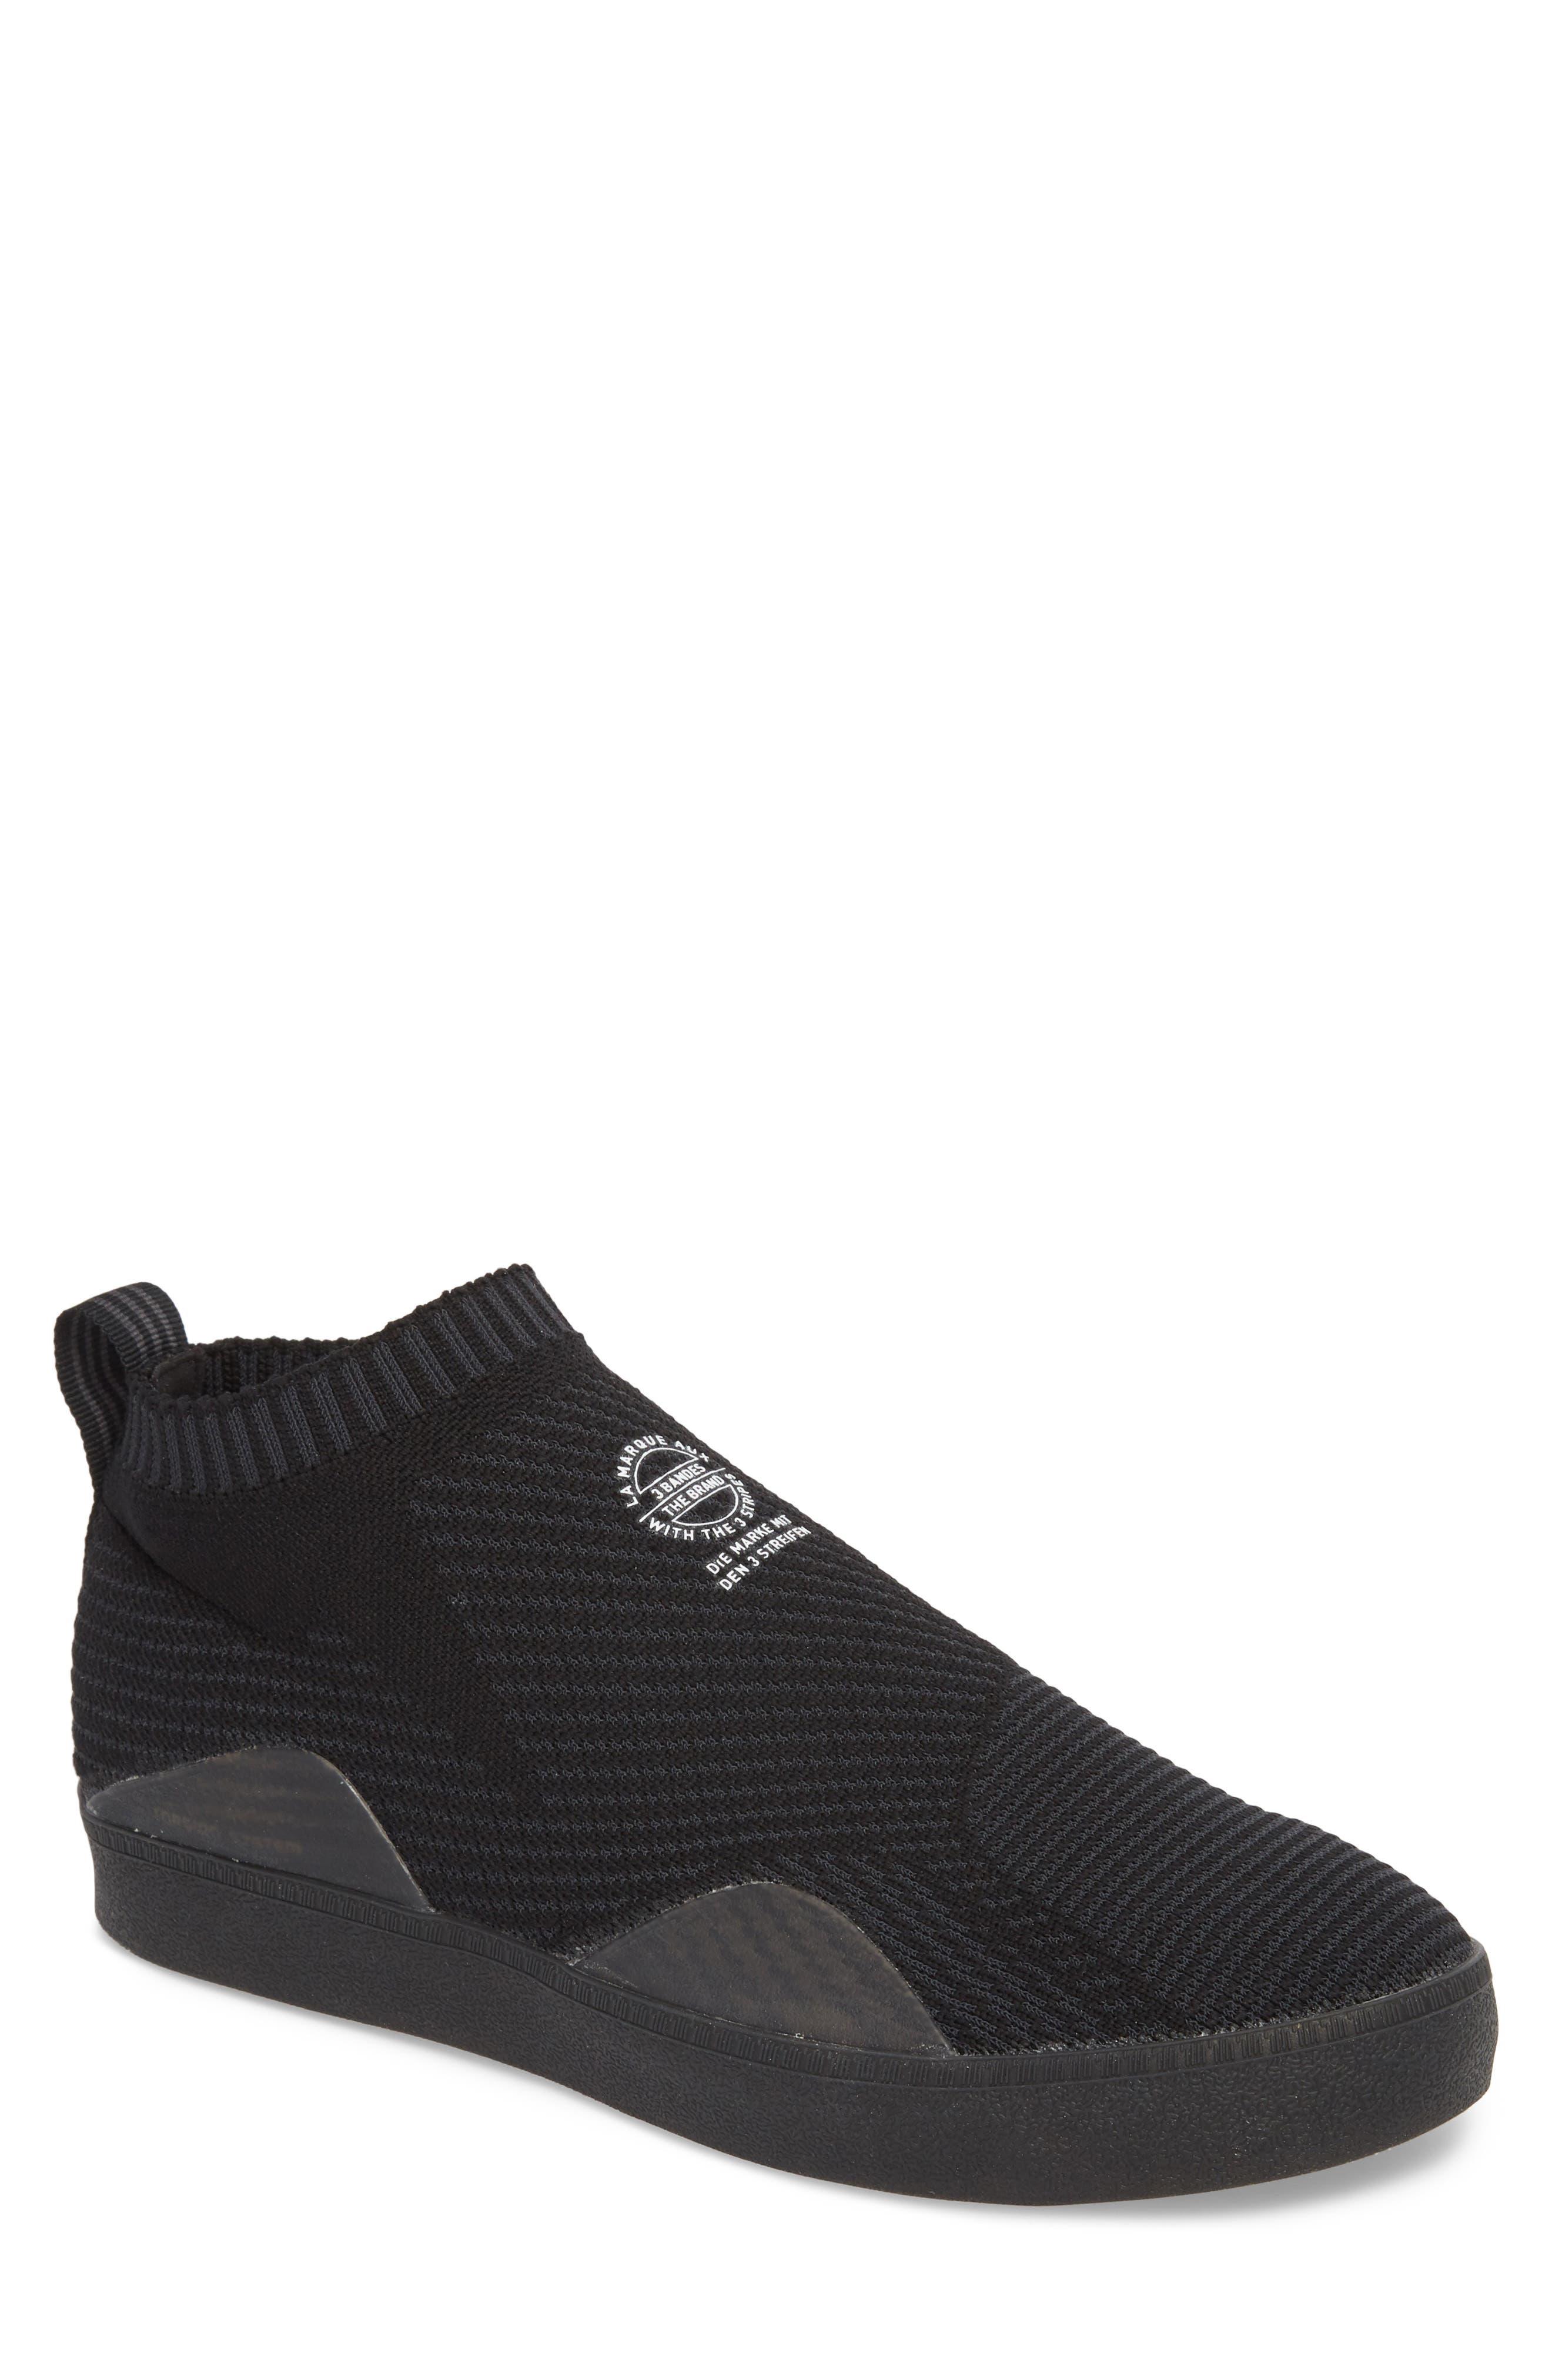 3ST.002 Primeknit Skateboarding Shoe,                         Main,                         color, 001